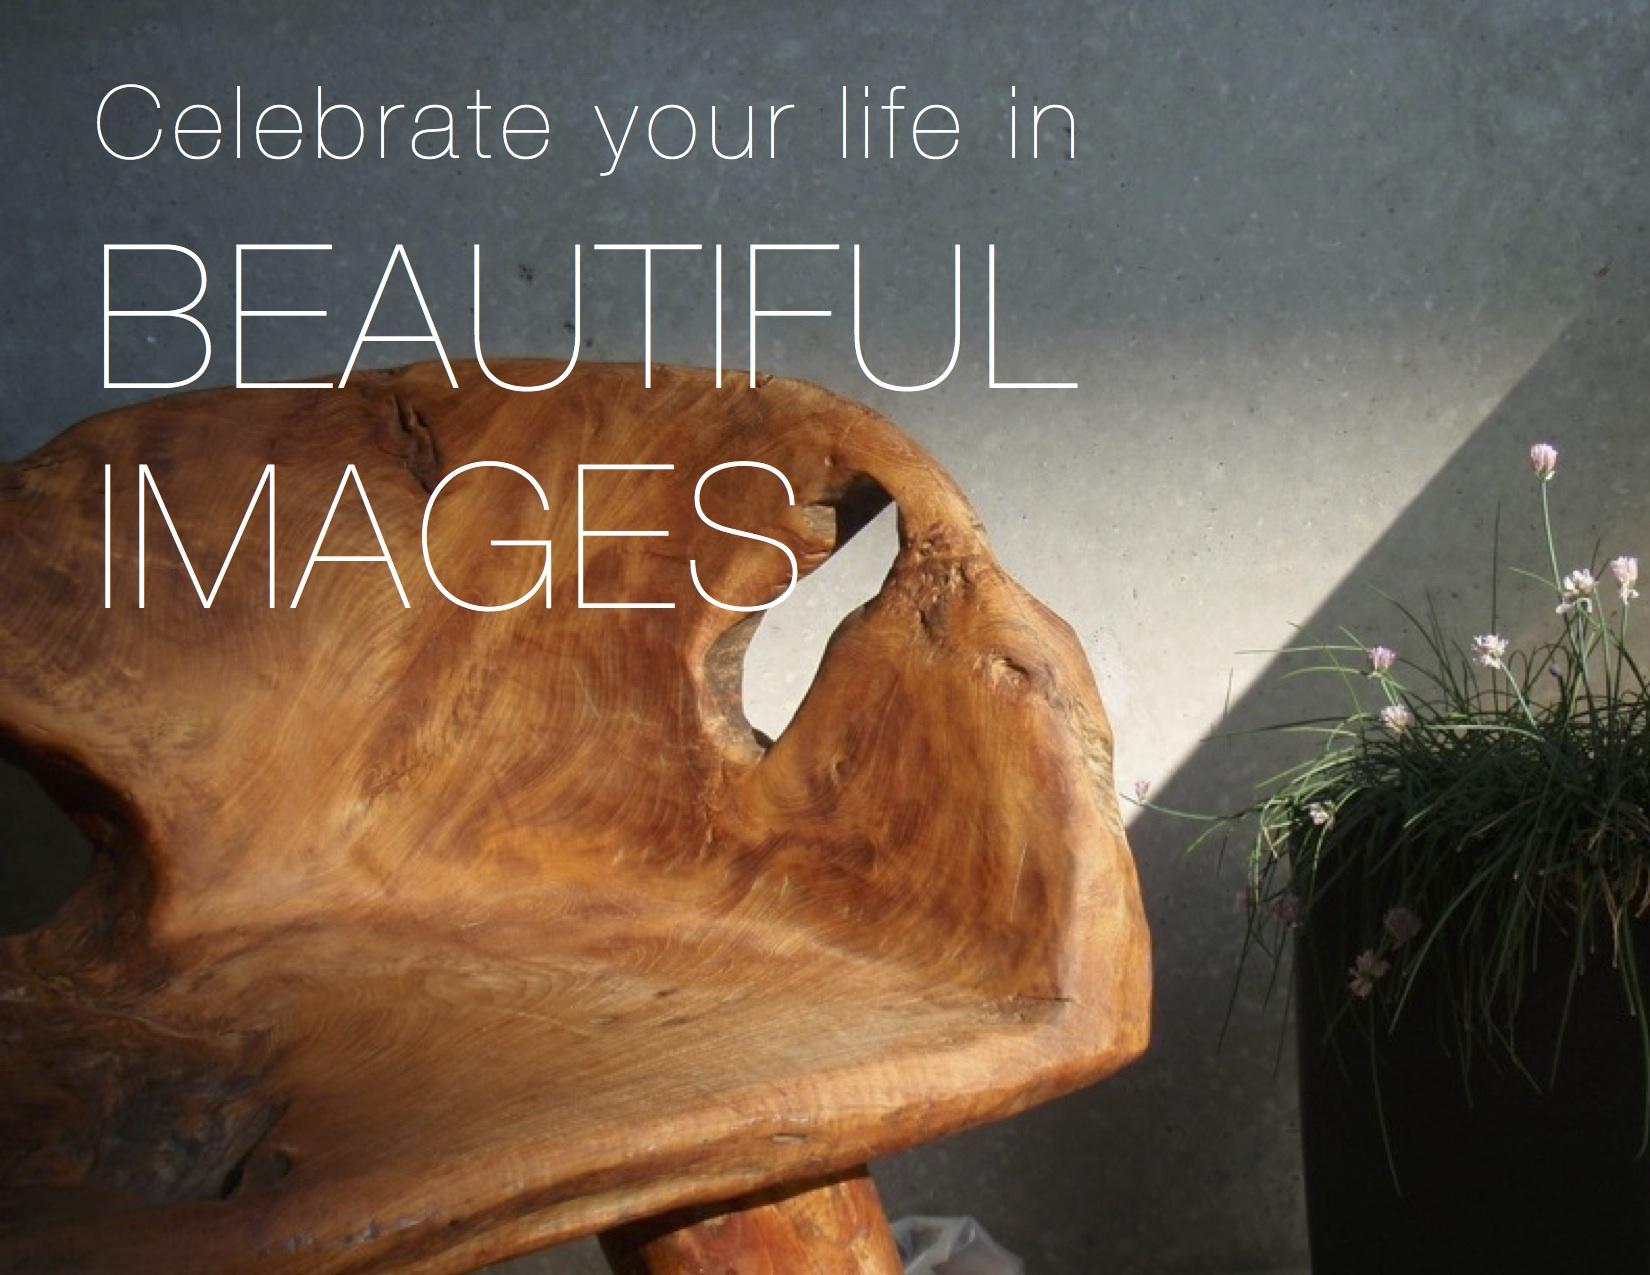 celebrate_your_life.jpg